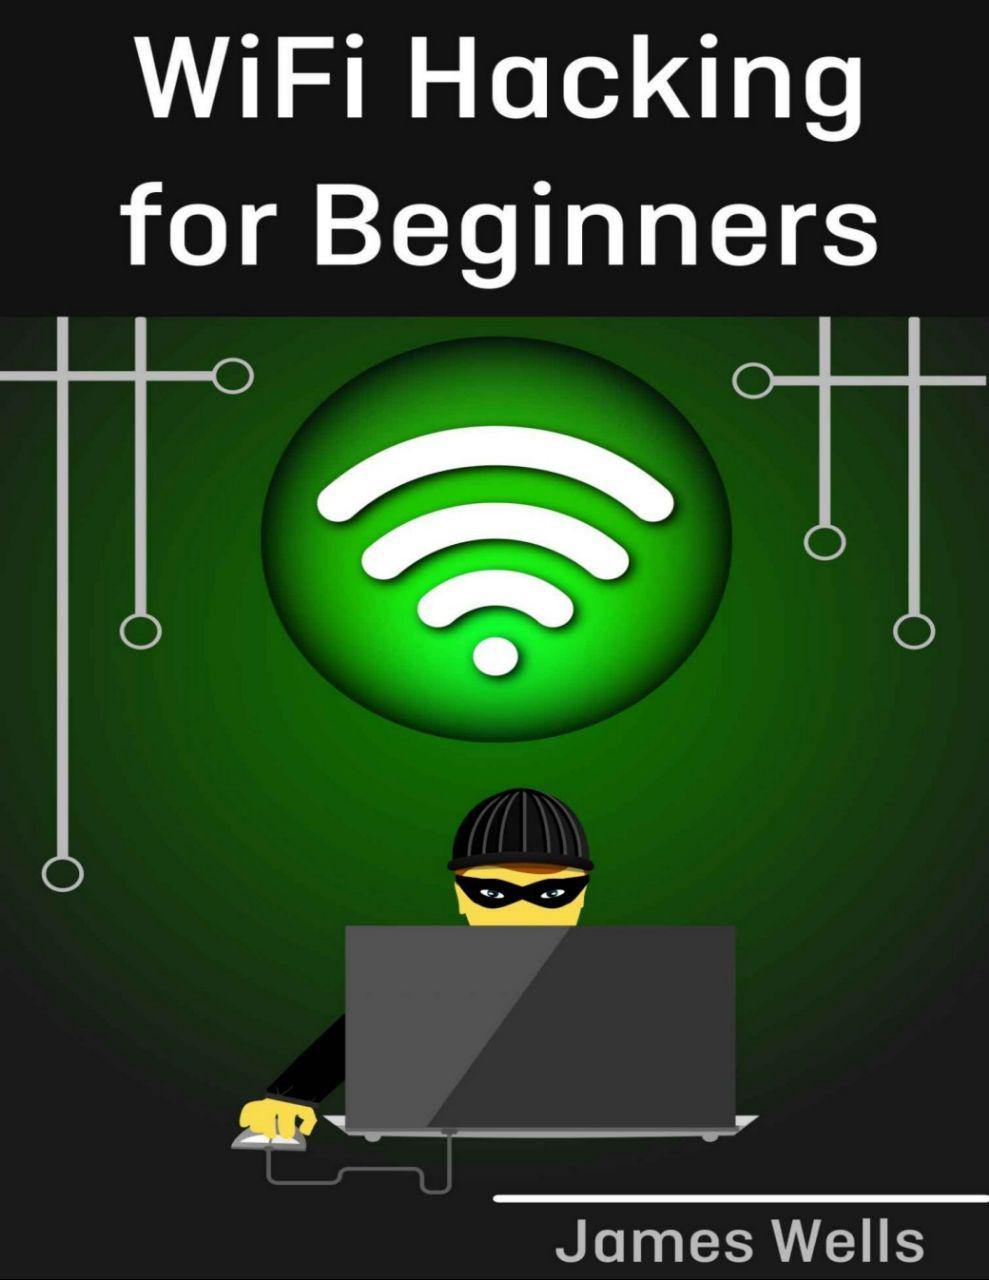 WIFI Hacking Course Download Google Drive Link - Nerd Hackers